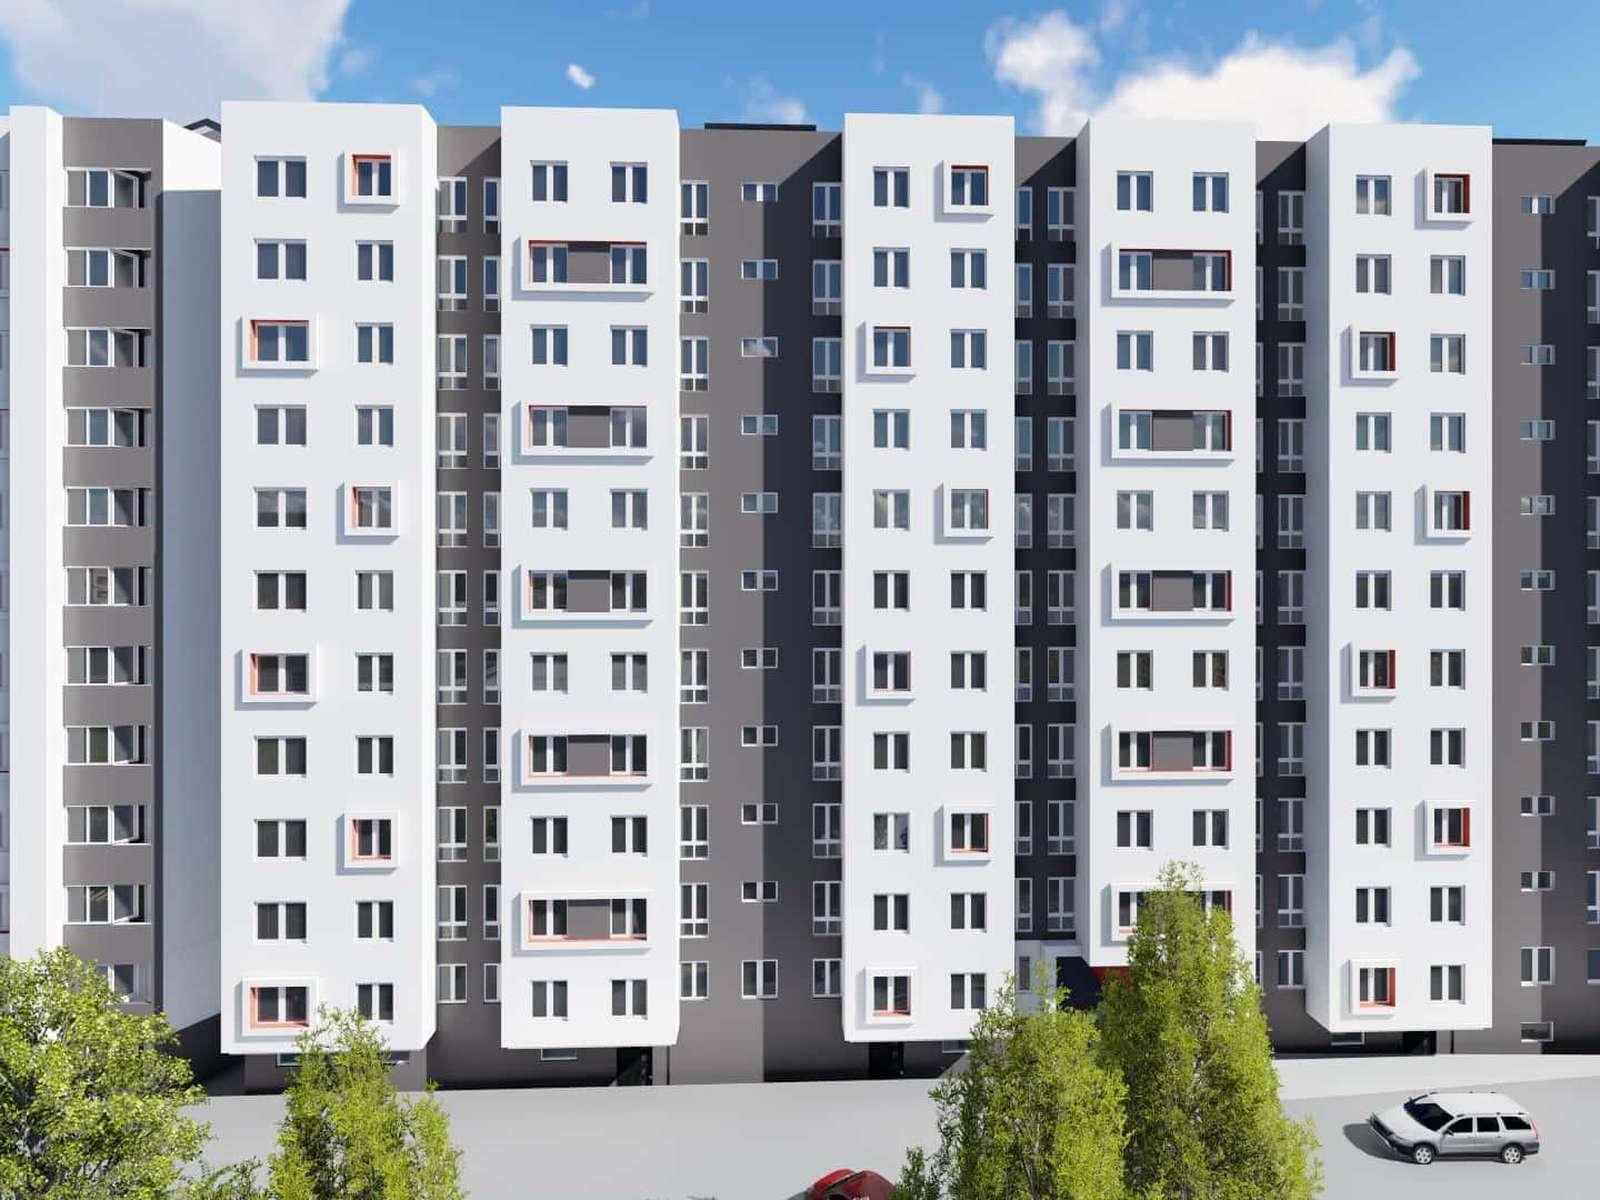 Apartamente cu 1 odaie la doar 14699 euro!!